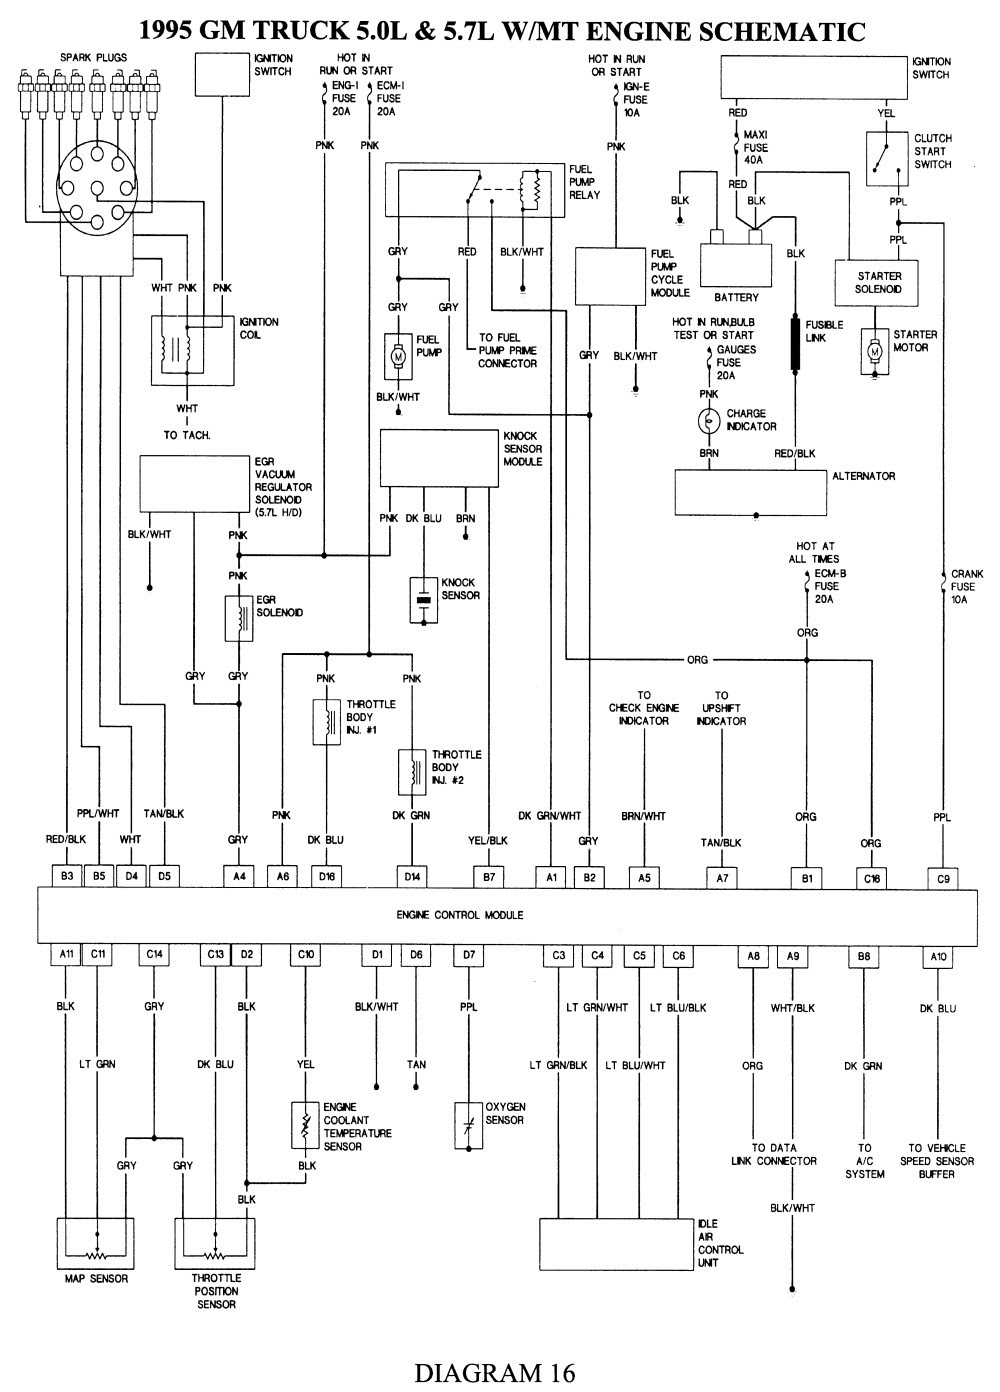 Chevrolet 350 Engine Diagram